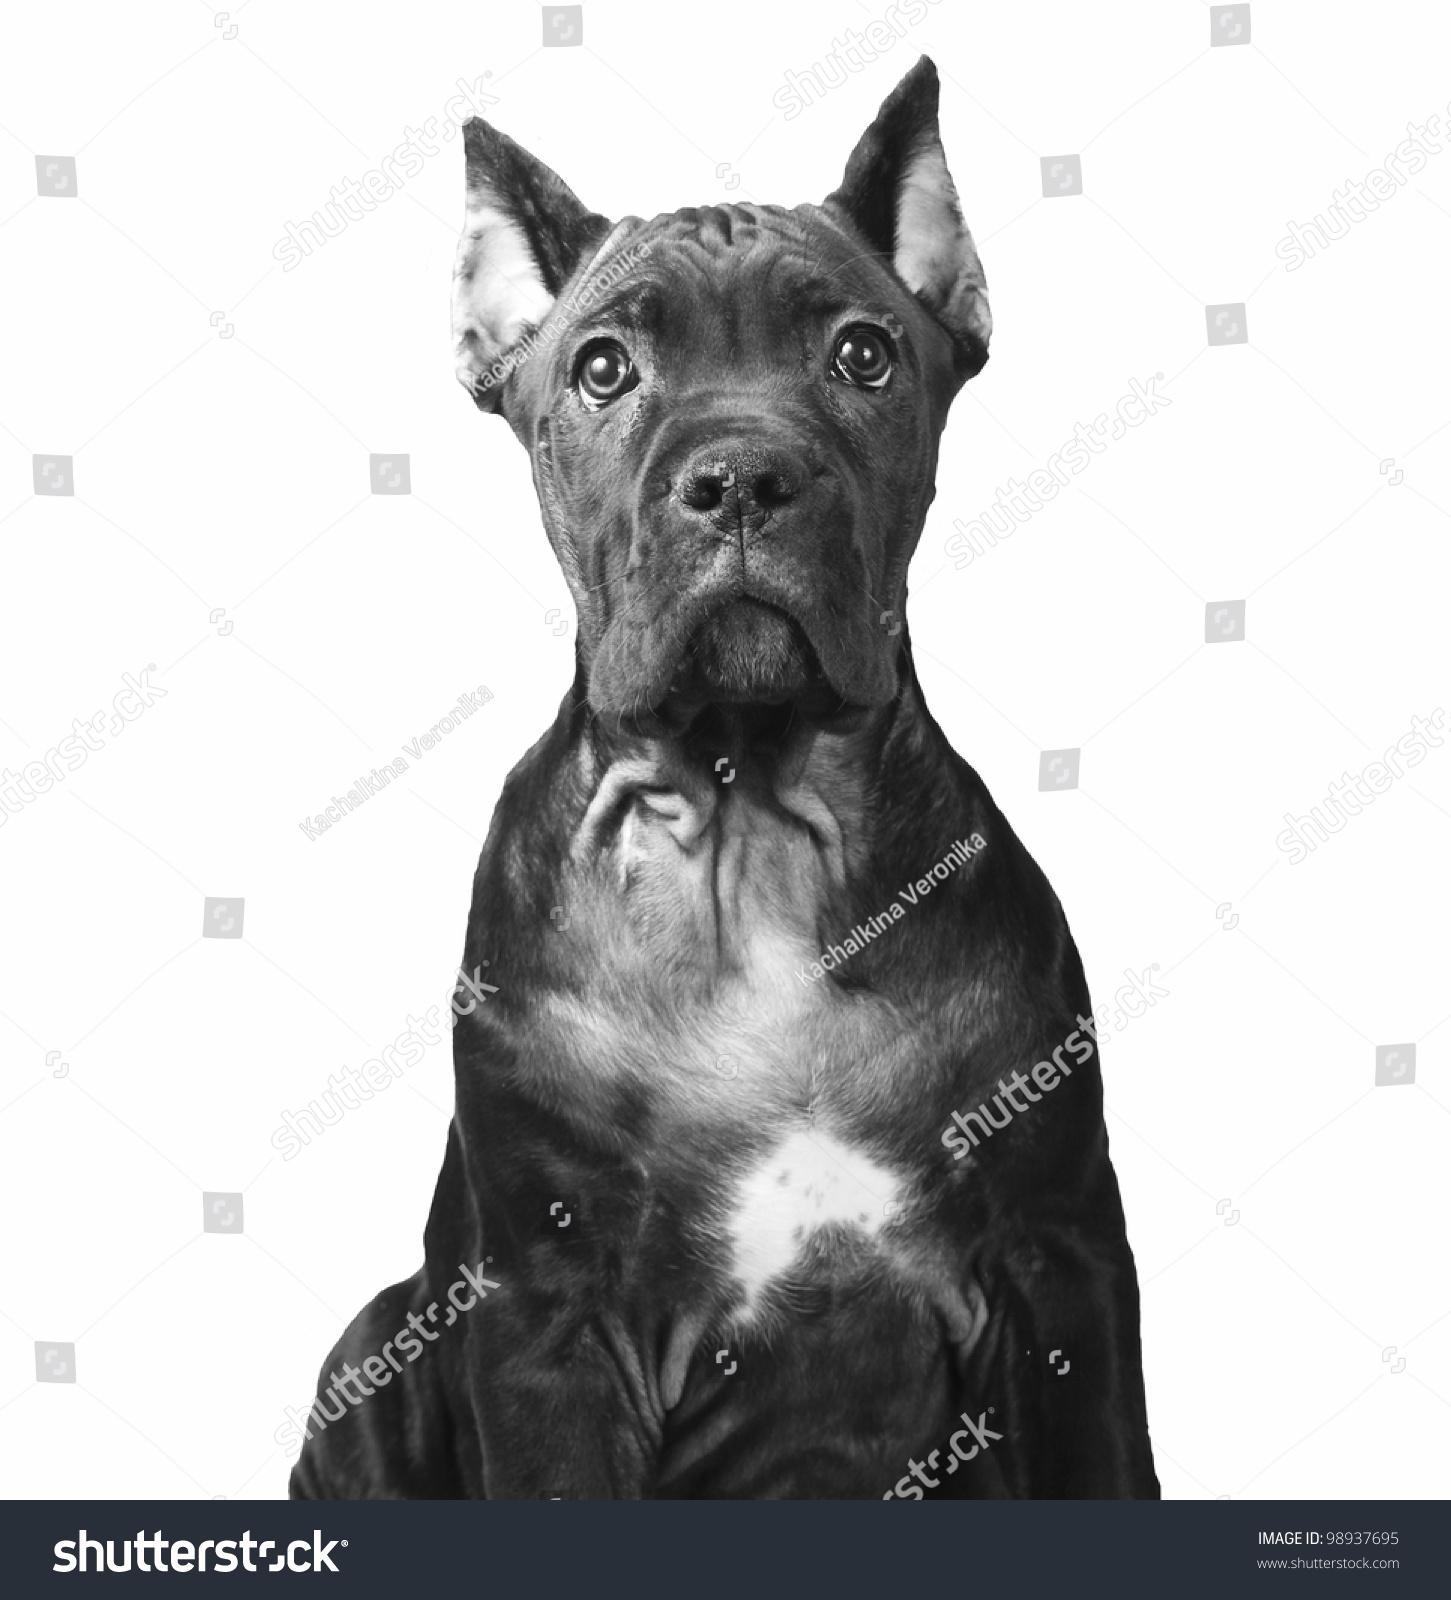 Vintage doggy style